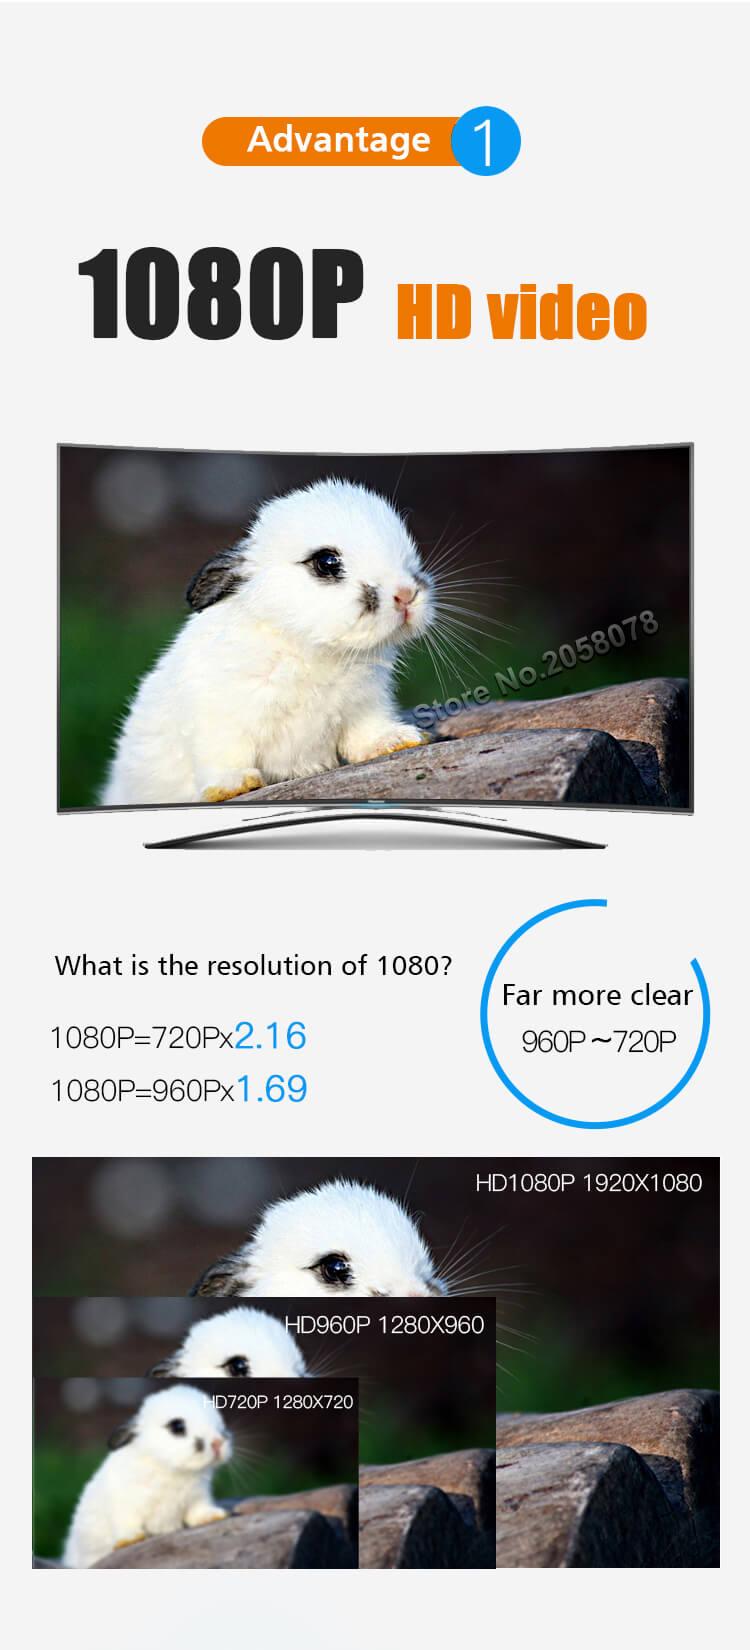 Veebikaamera – 1920 x 1080